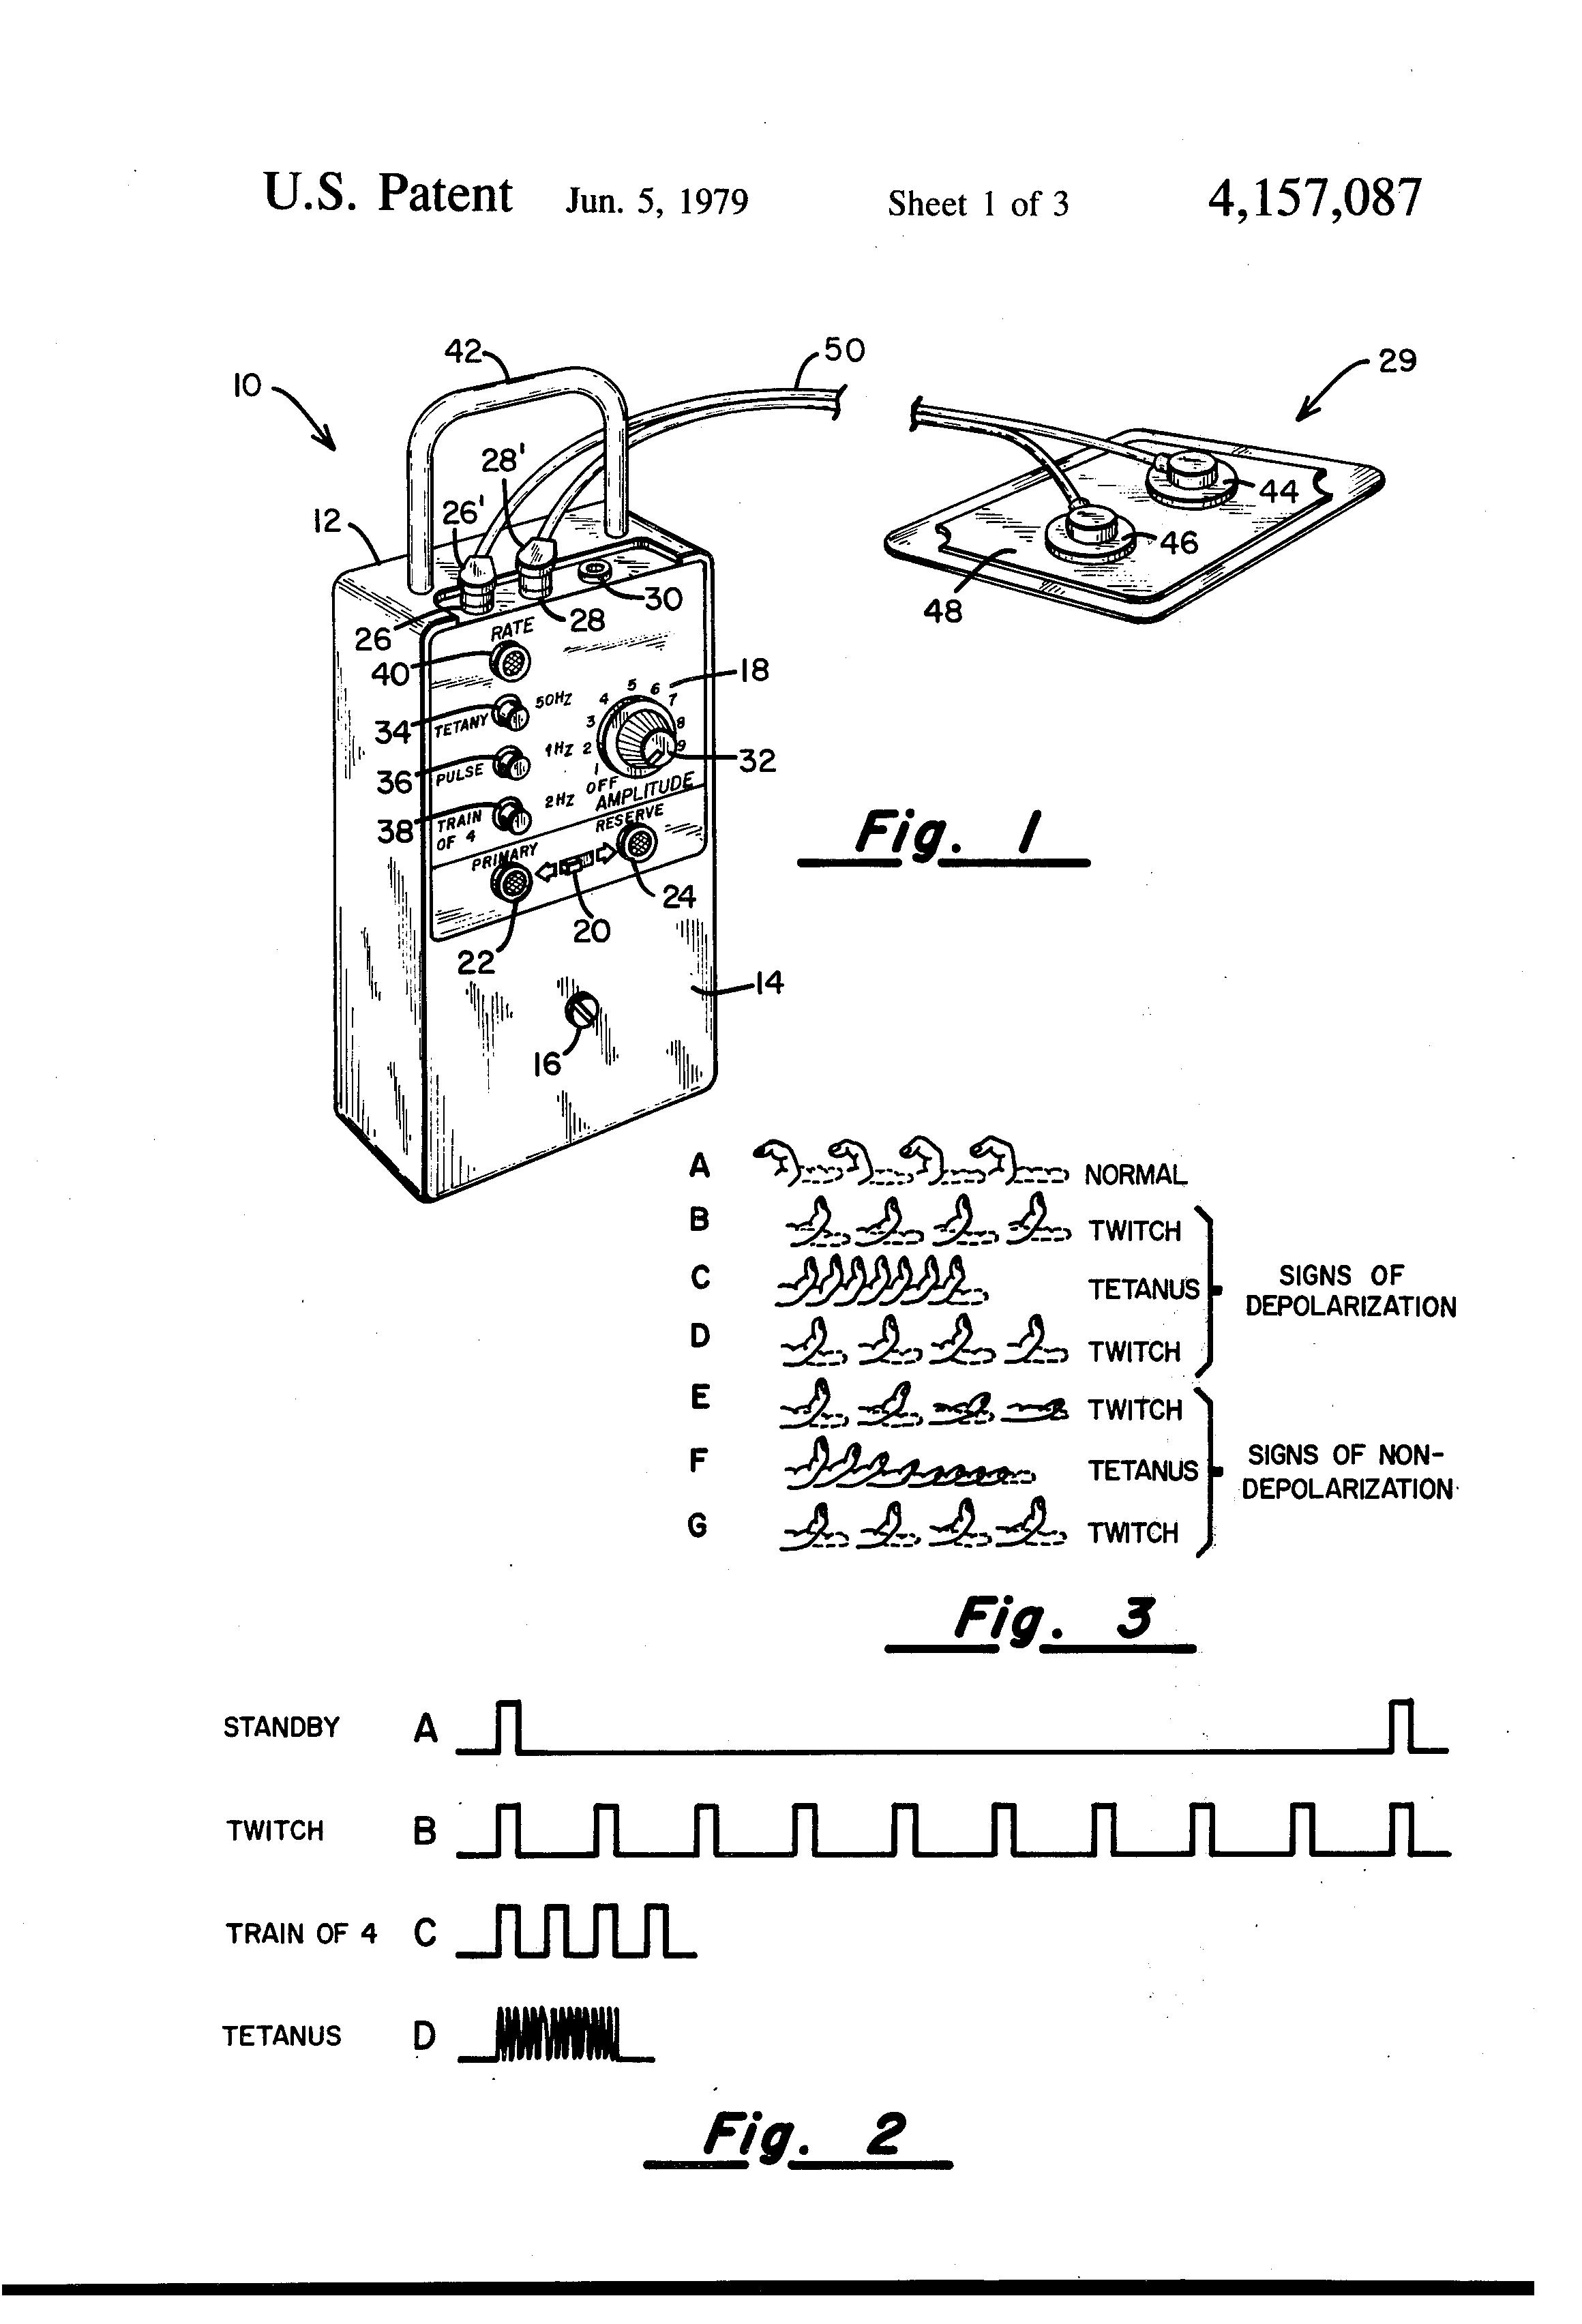 patent us4157087 - peripheral nerve stimulator